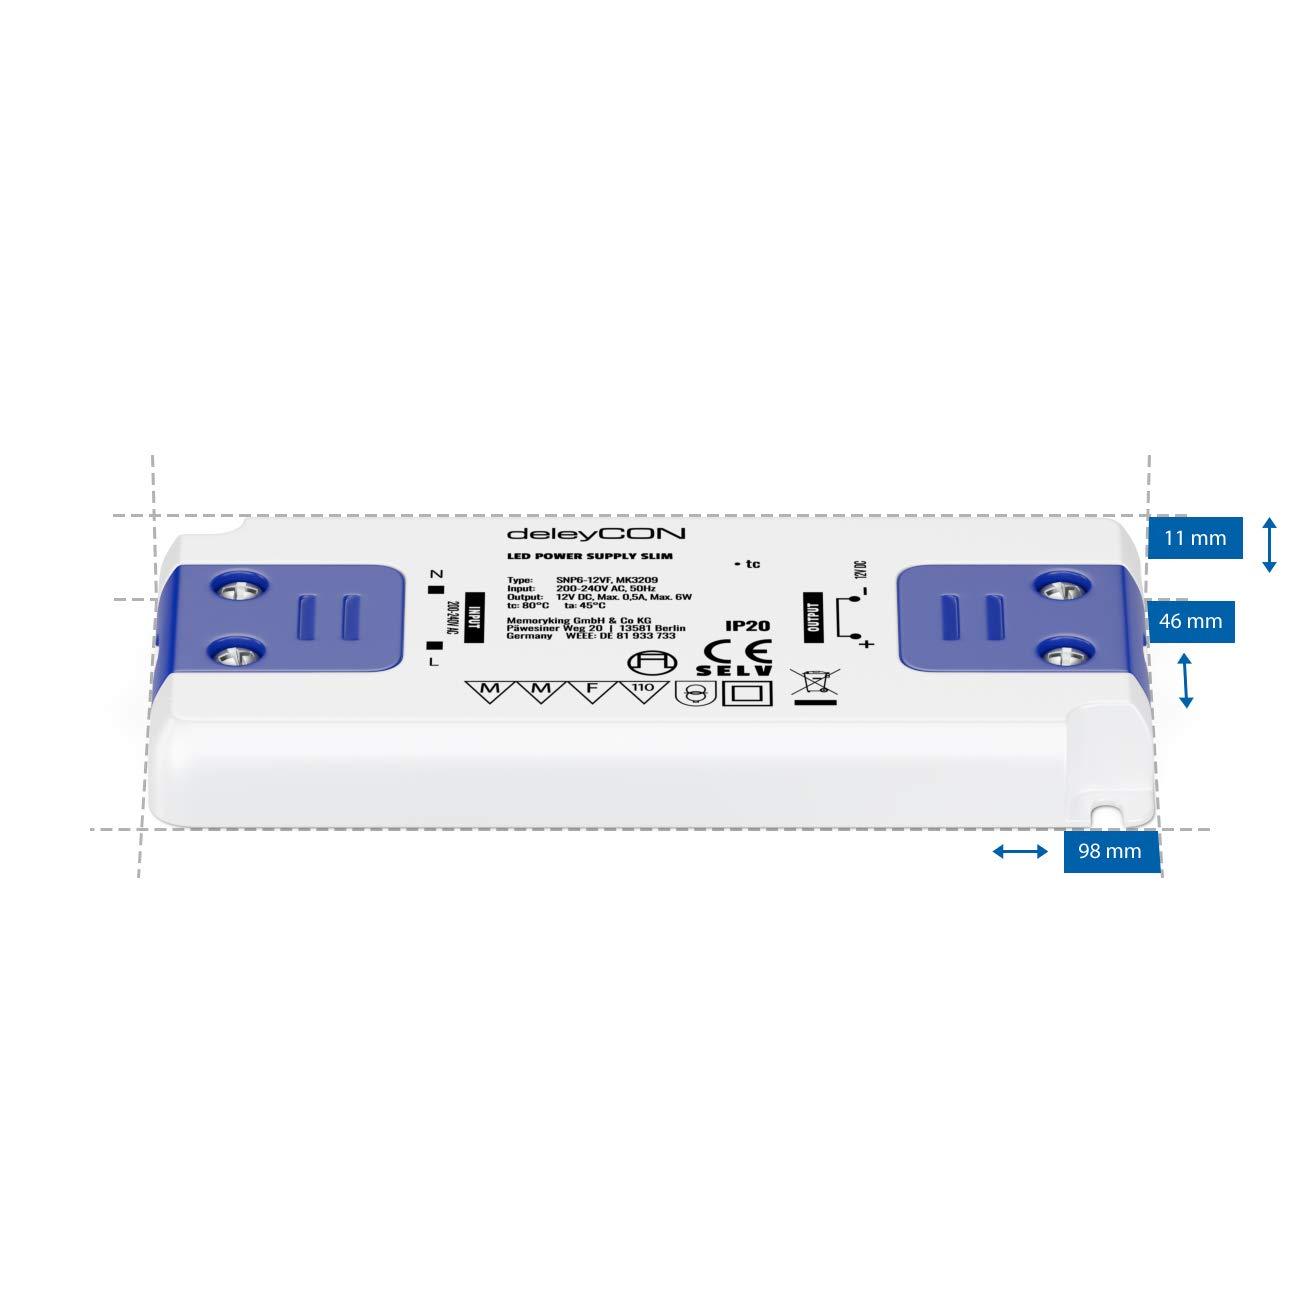 deleyCON 12V LED Transformador Adaptador Slim 0-20W 200-240V a 12V DC LED L/ámparas Cintas de Luz G4 MR11 MR16 Luces Sobrecarga Sobrecalentamiento Cortocircuito